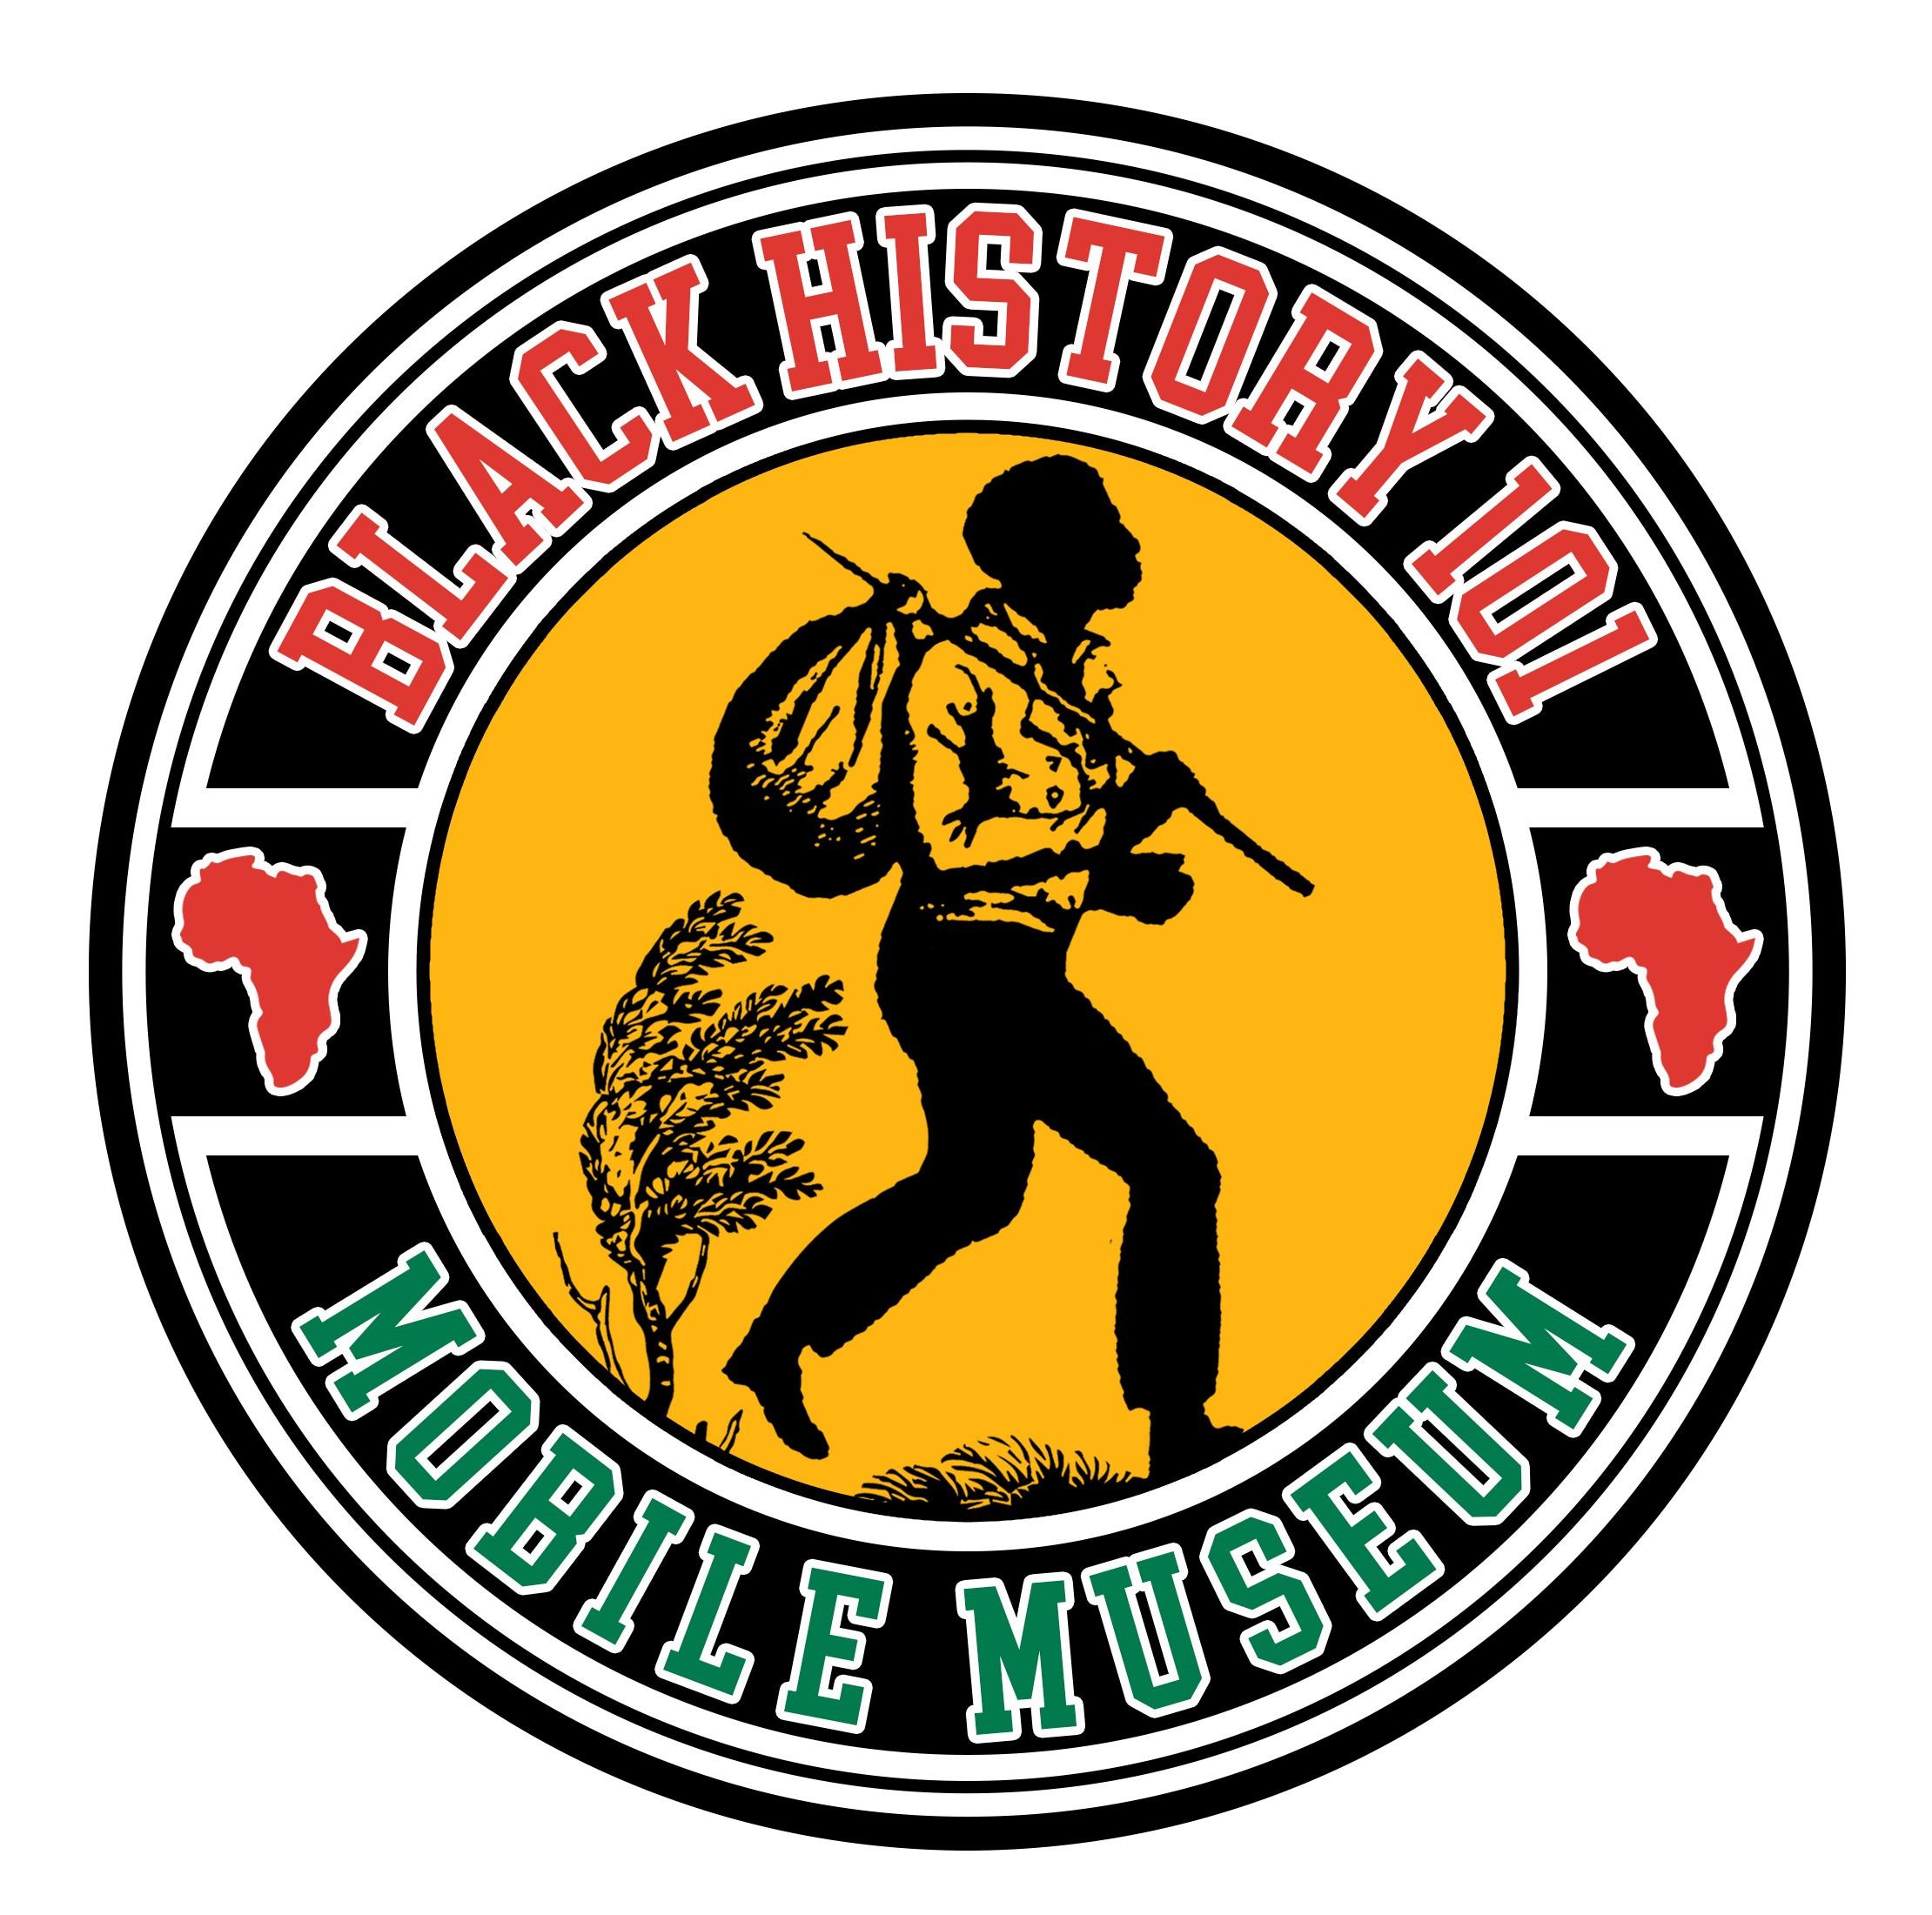 Black History 101 Mobile Museum @ Beaver Island Community School